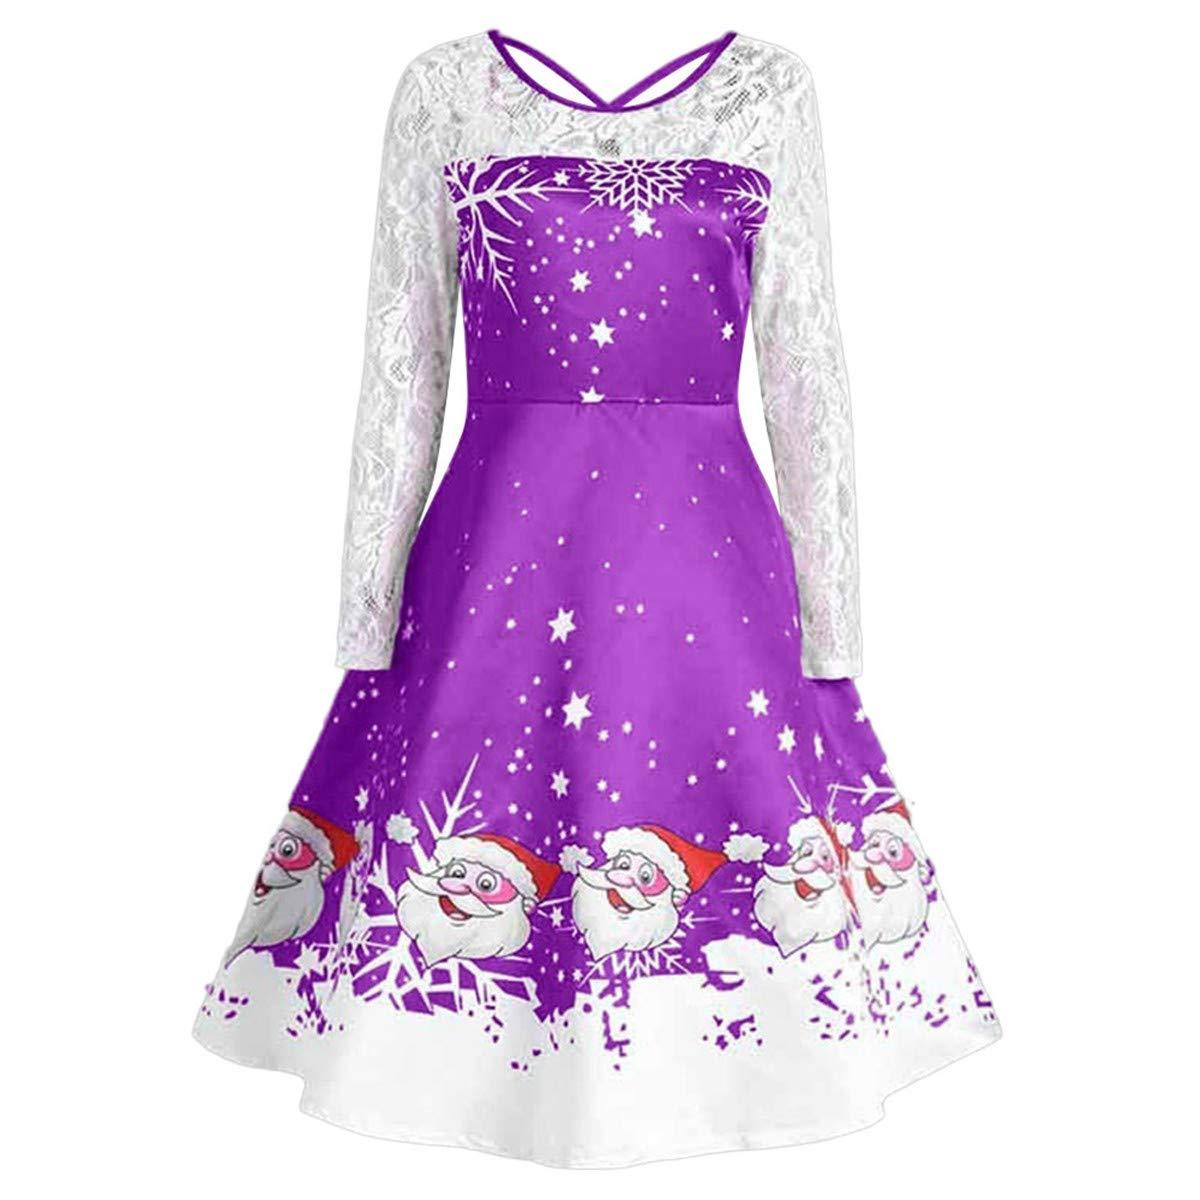 KESEE Vintage Boho Maxi Beach Floral Dress Casual Loose T-Shirt Dress KESEE_8302